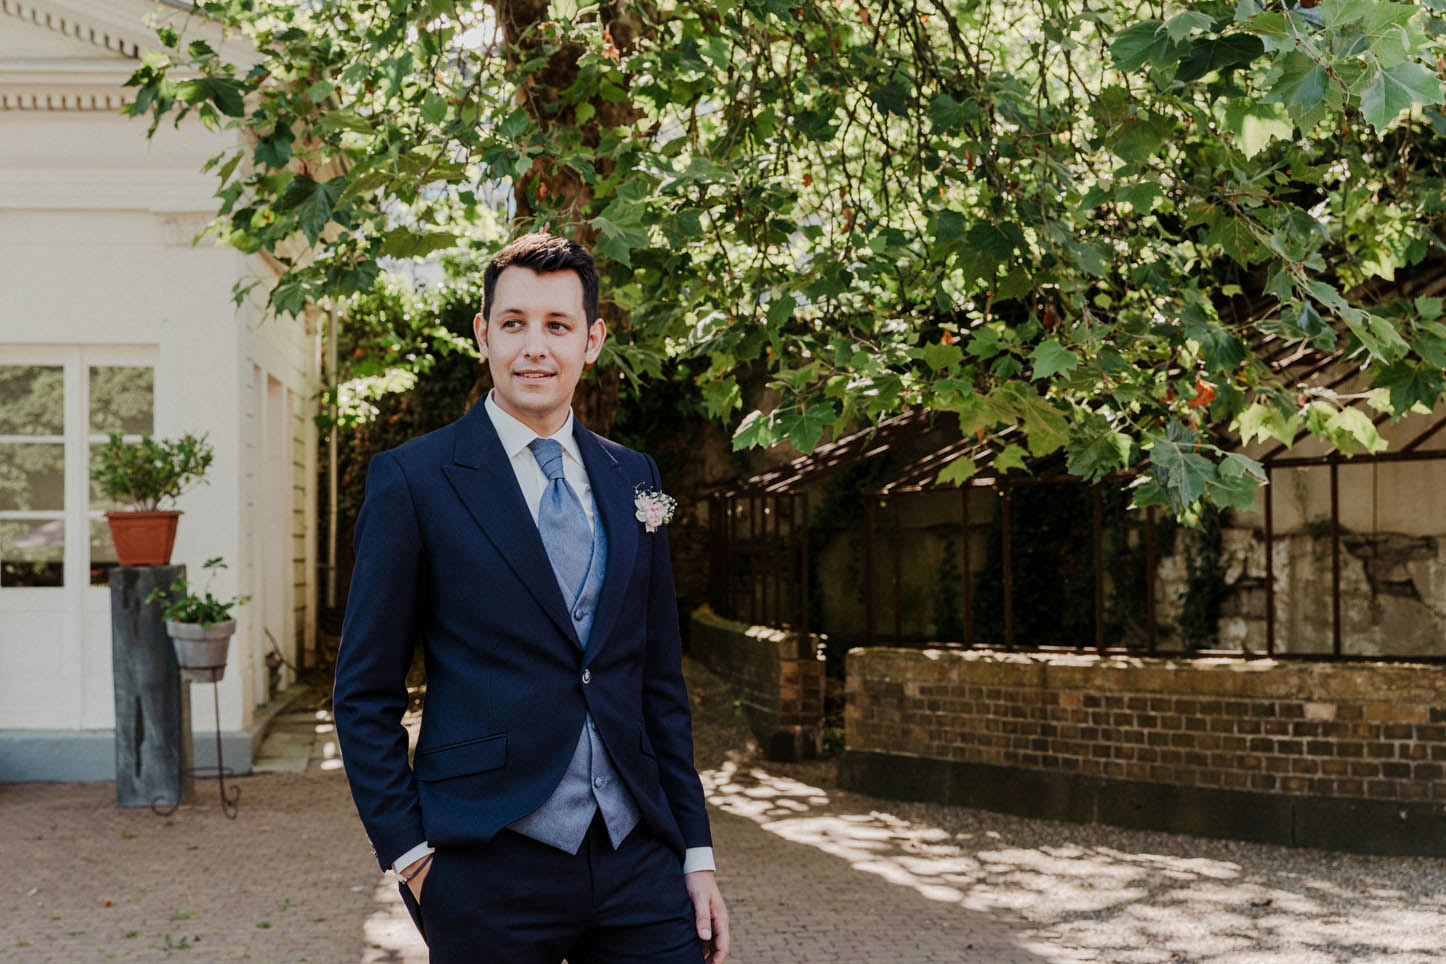 Hugo Boss Anzug für den Bräutigam